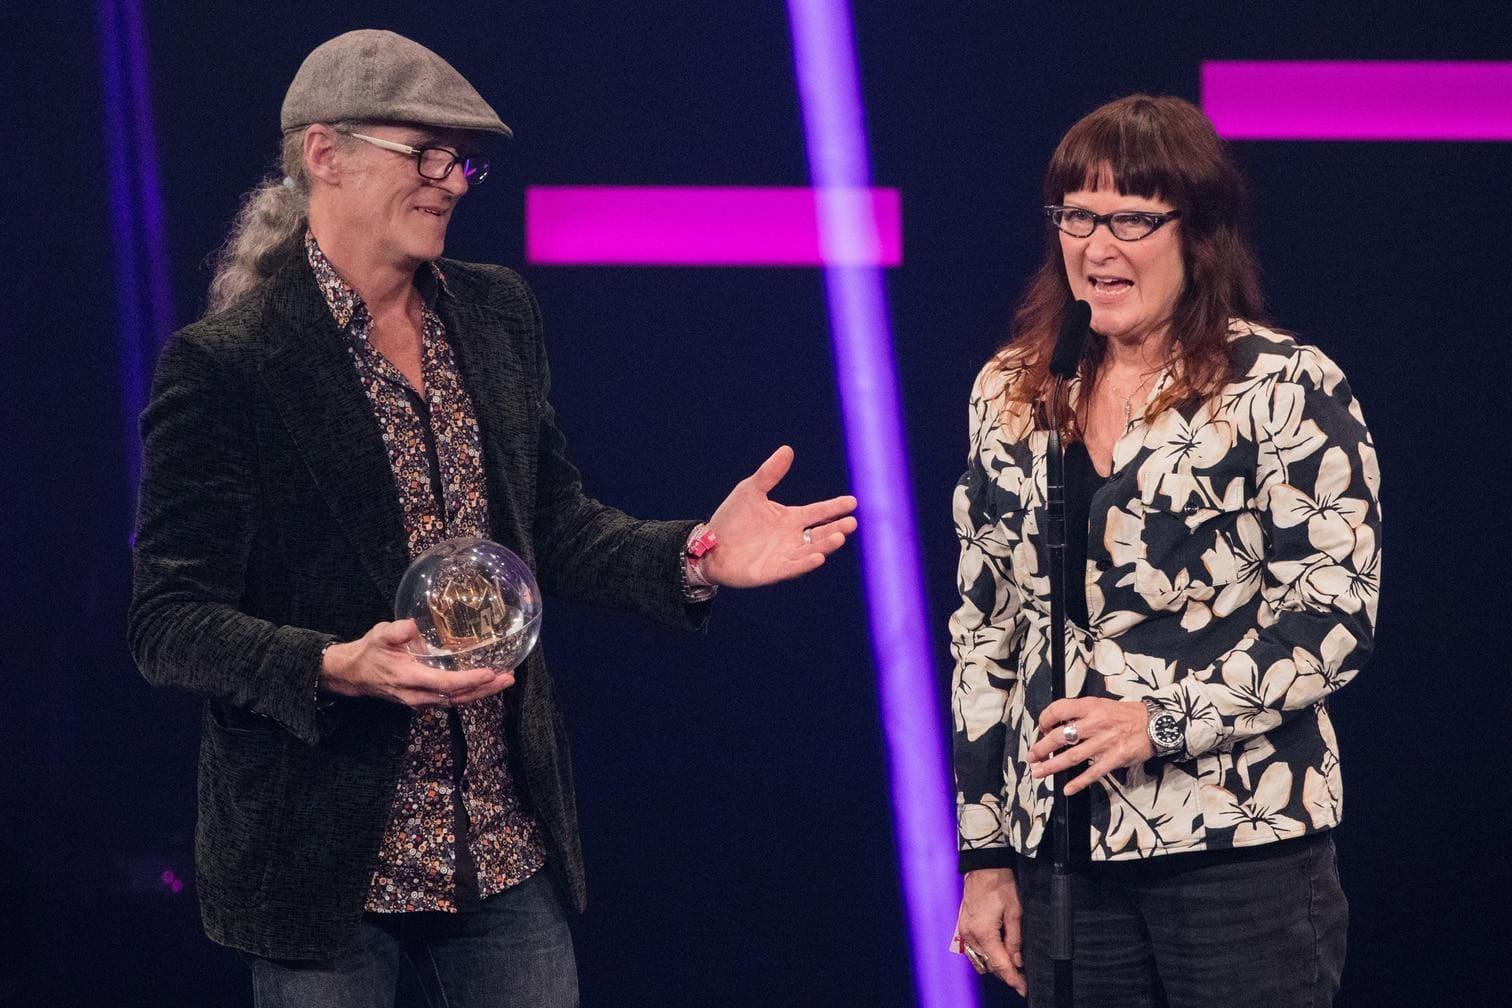 <p><strong>1LIVE Sonderpreis</strong>: Birgit und Horst Lohmeyer</p> Foto: Rolf Vennenbernd/dpa